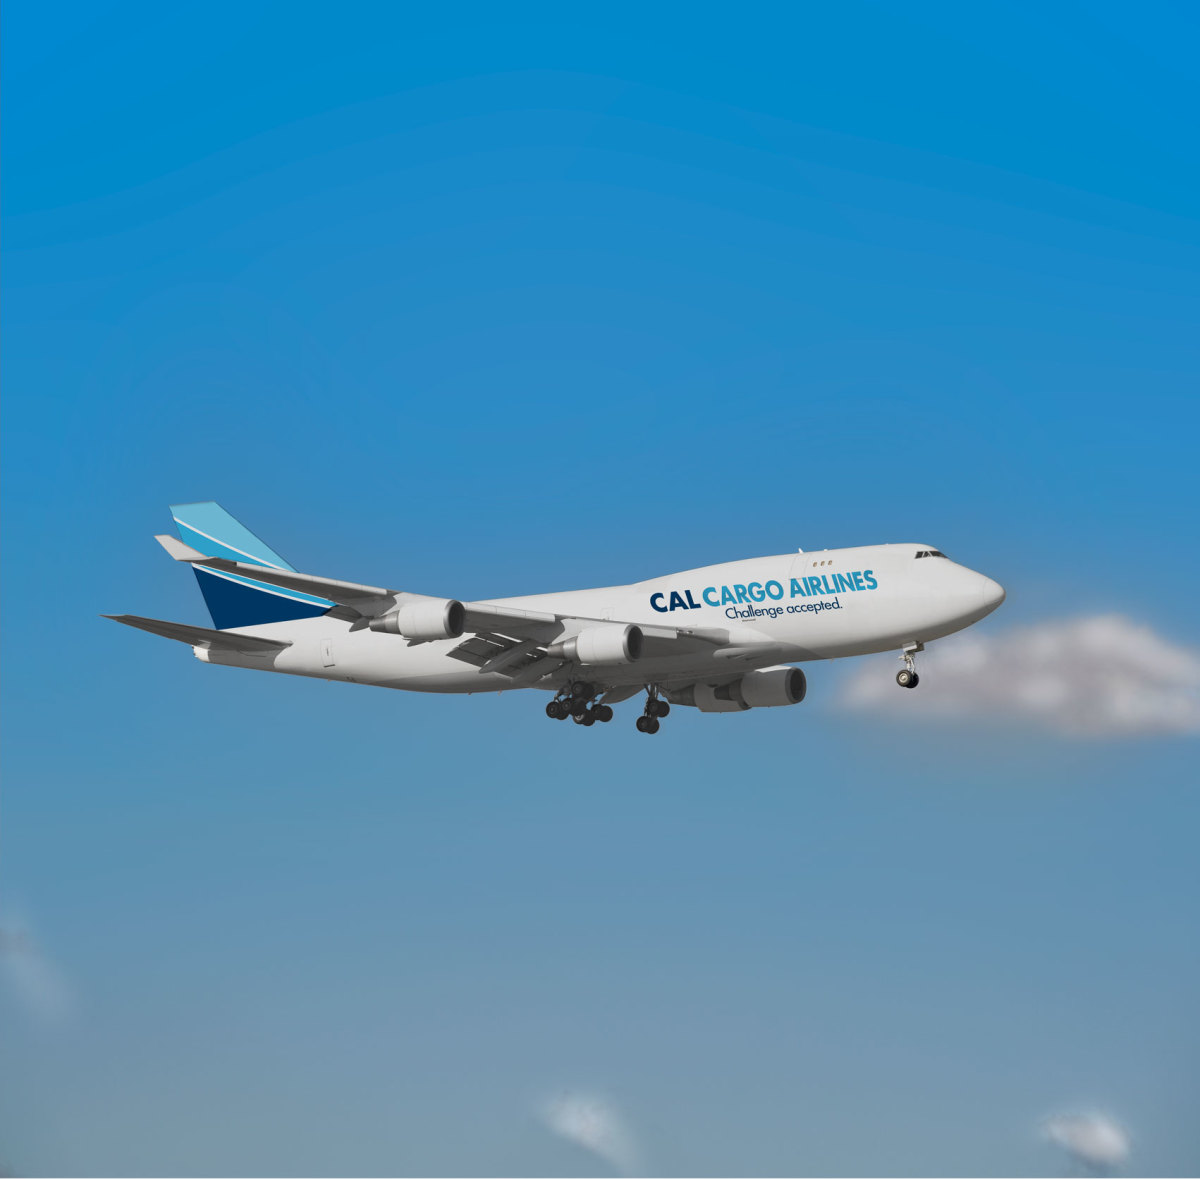 CALカーゴ・エアラインズ、テルアビブ/オスロ線に就航 747で週1便 | FlyTeam ニュース